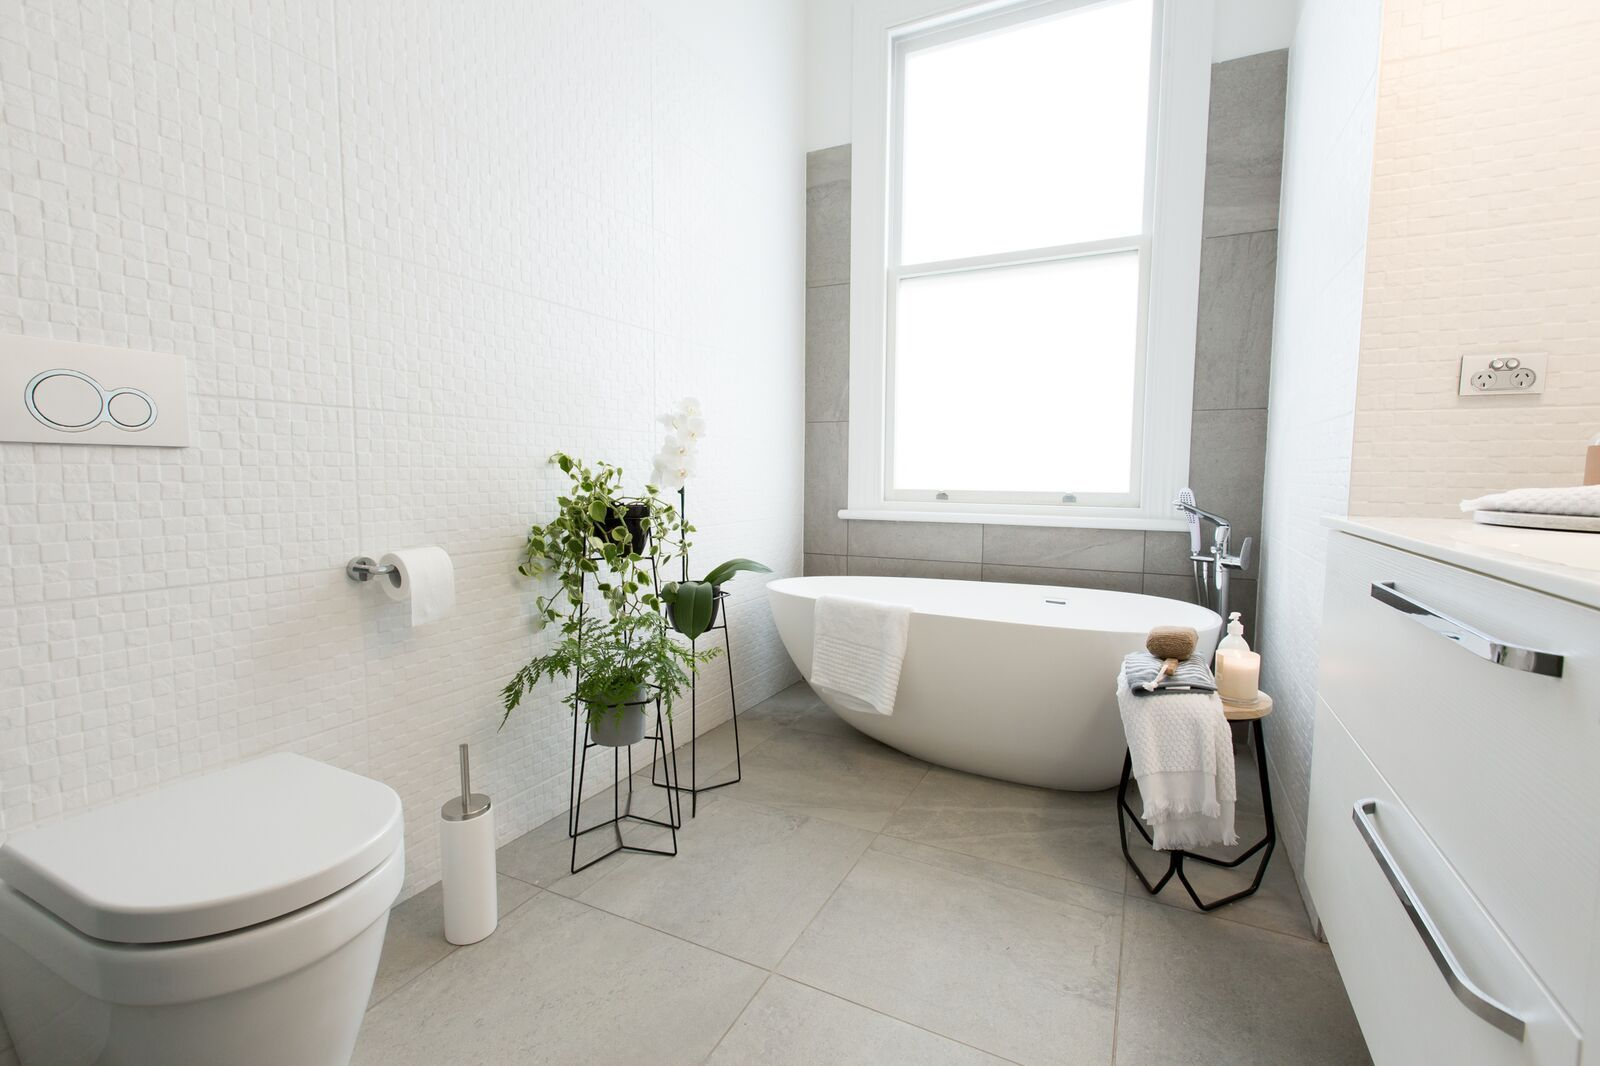 The Block Nz Bathroom Reveals Bathroom Design Inspiration The Block Bathroom Bathroom Layout